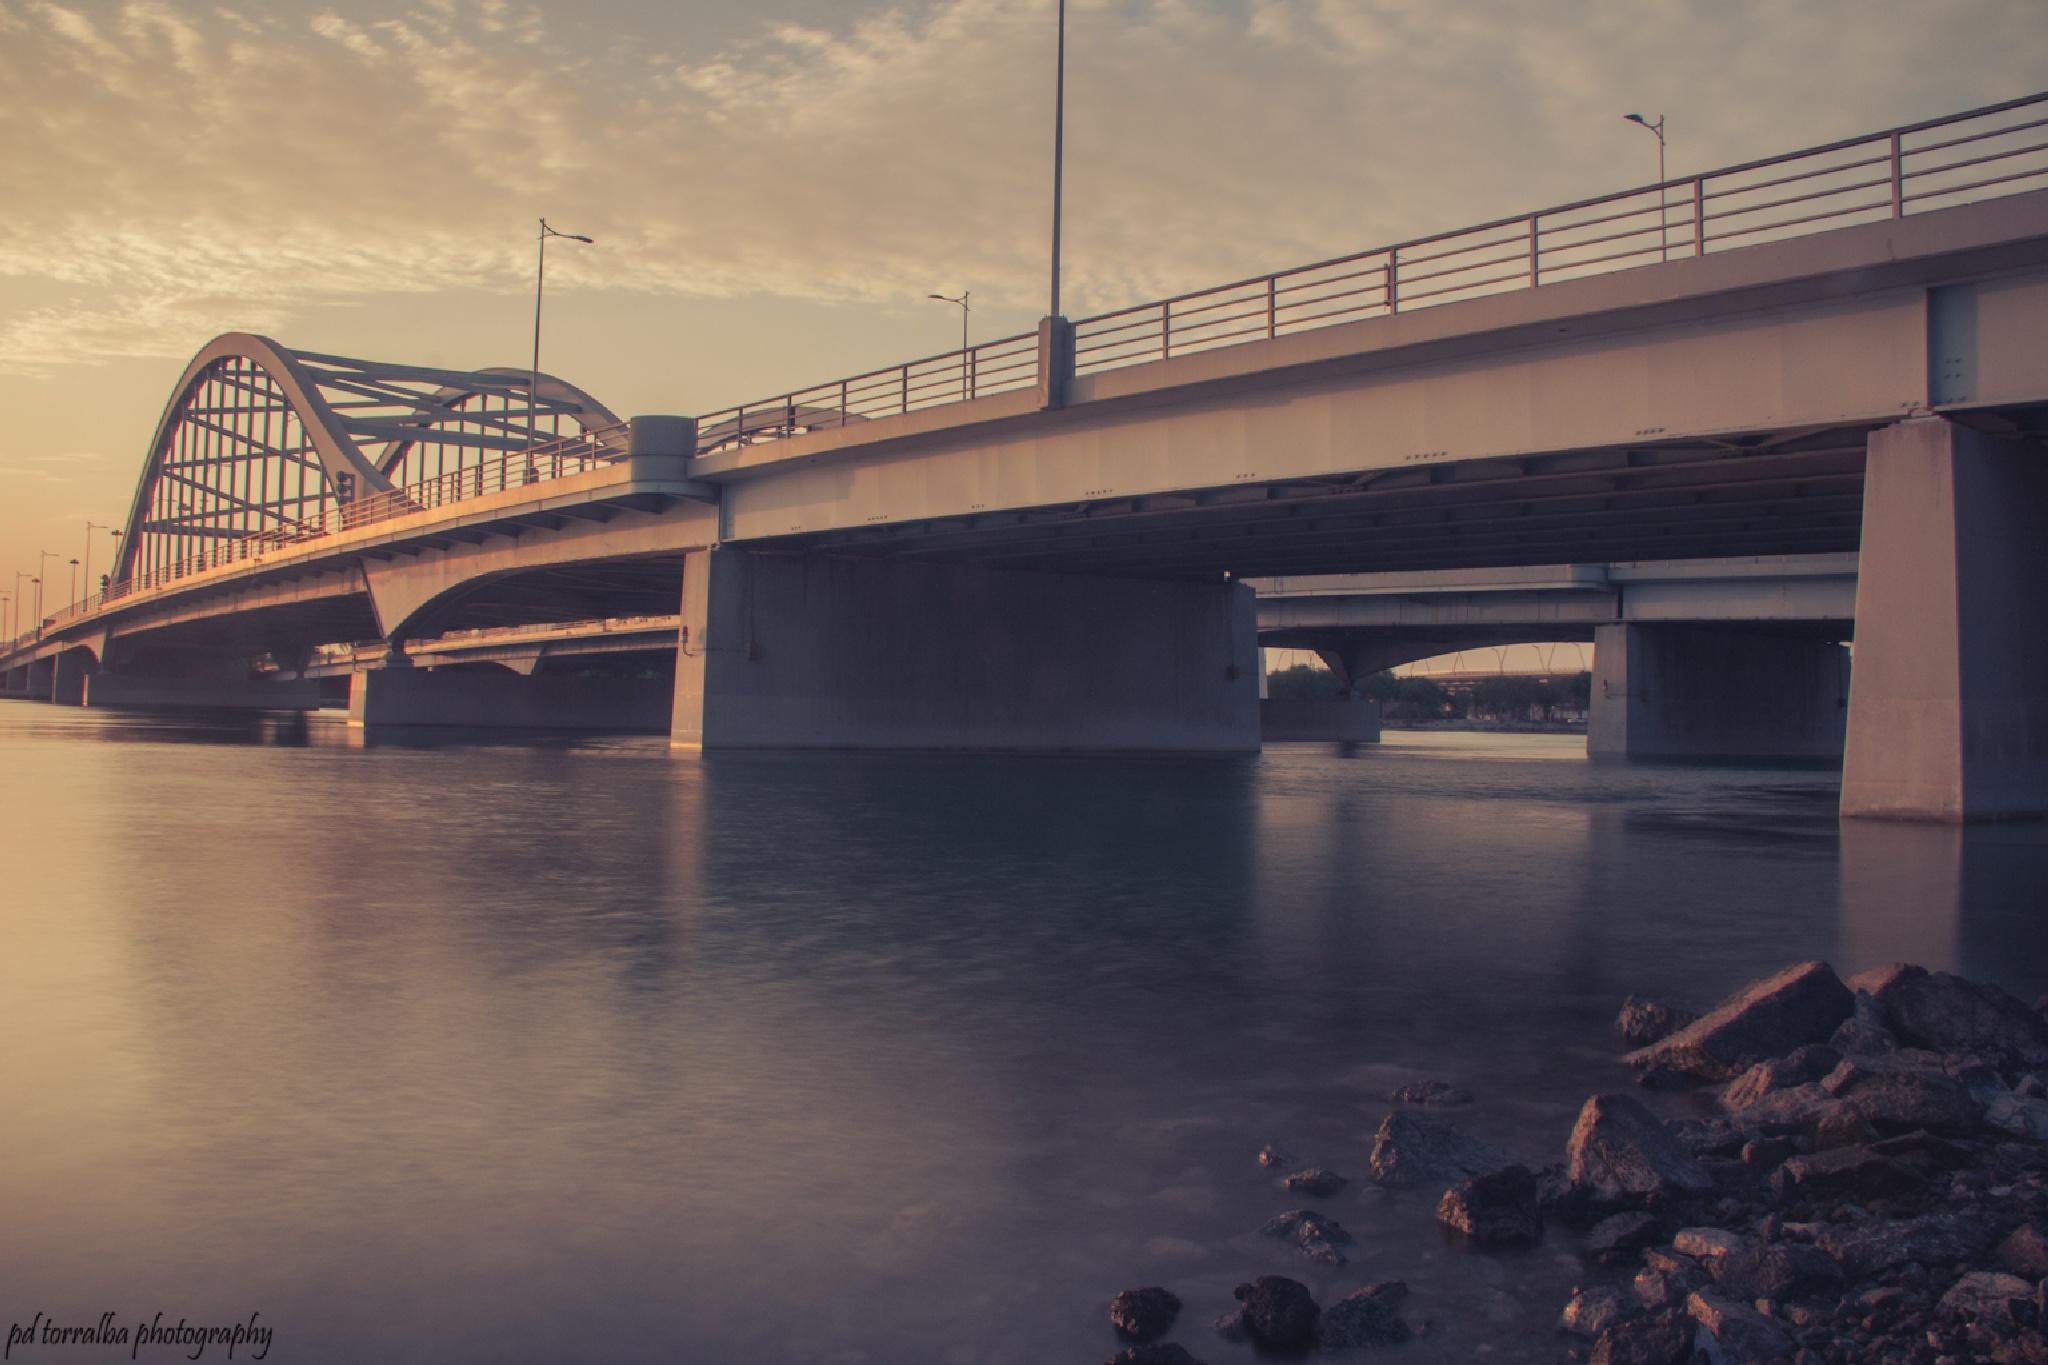 maqta bridge by ptorralba08